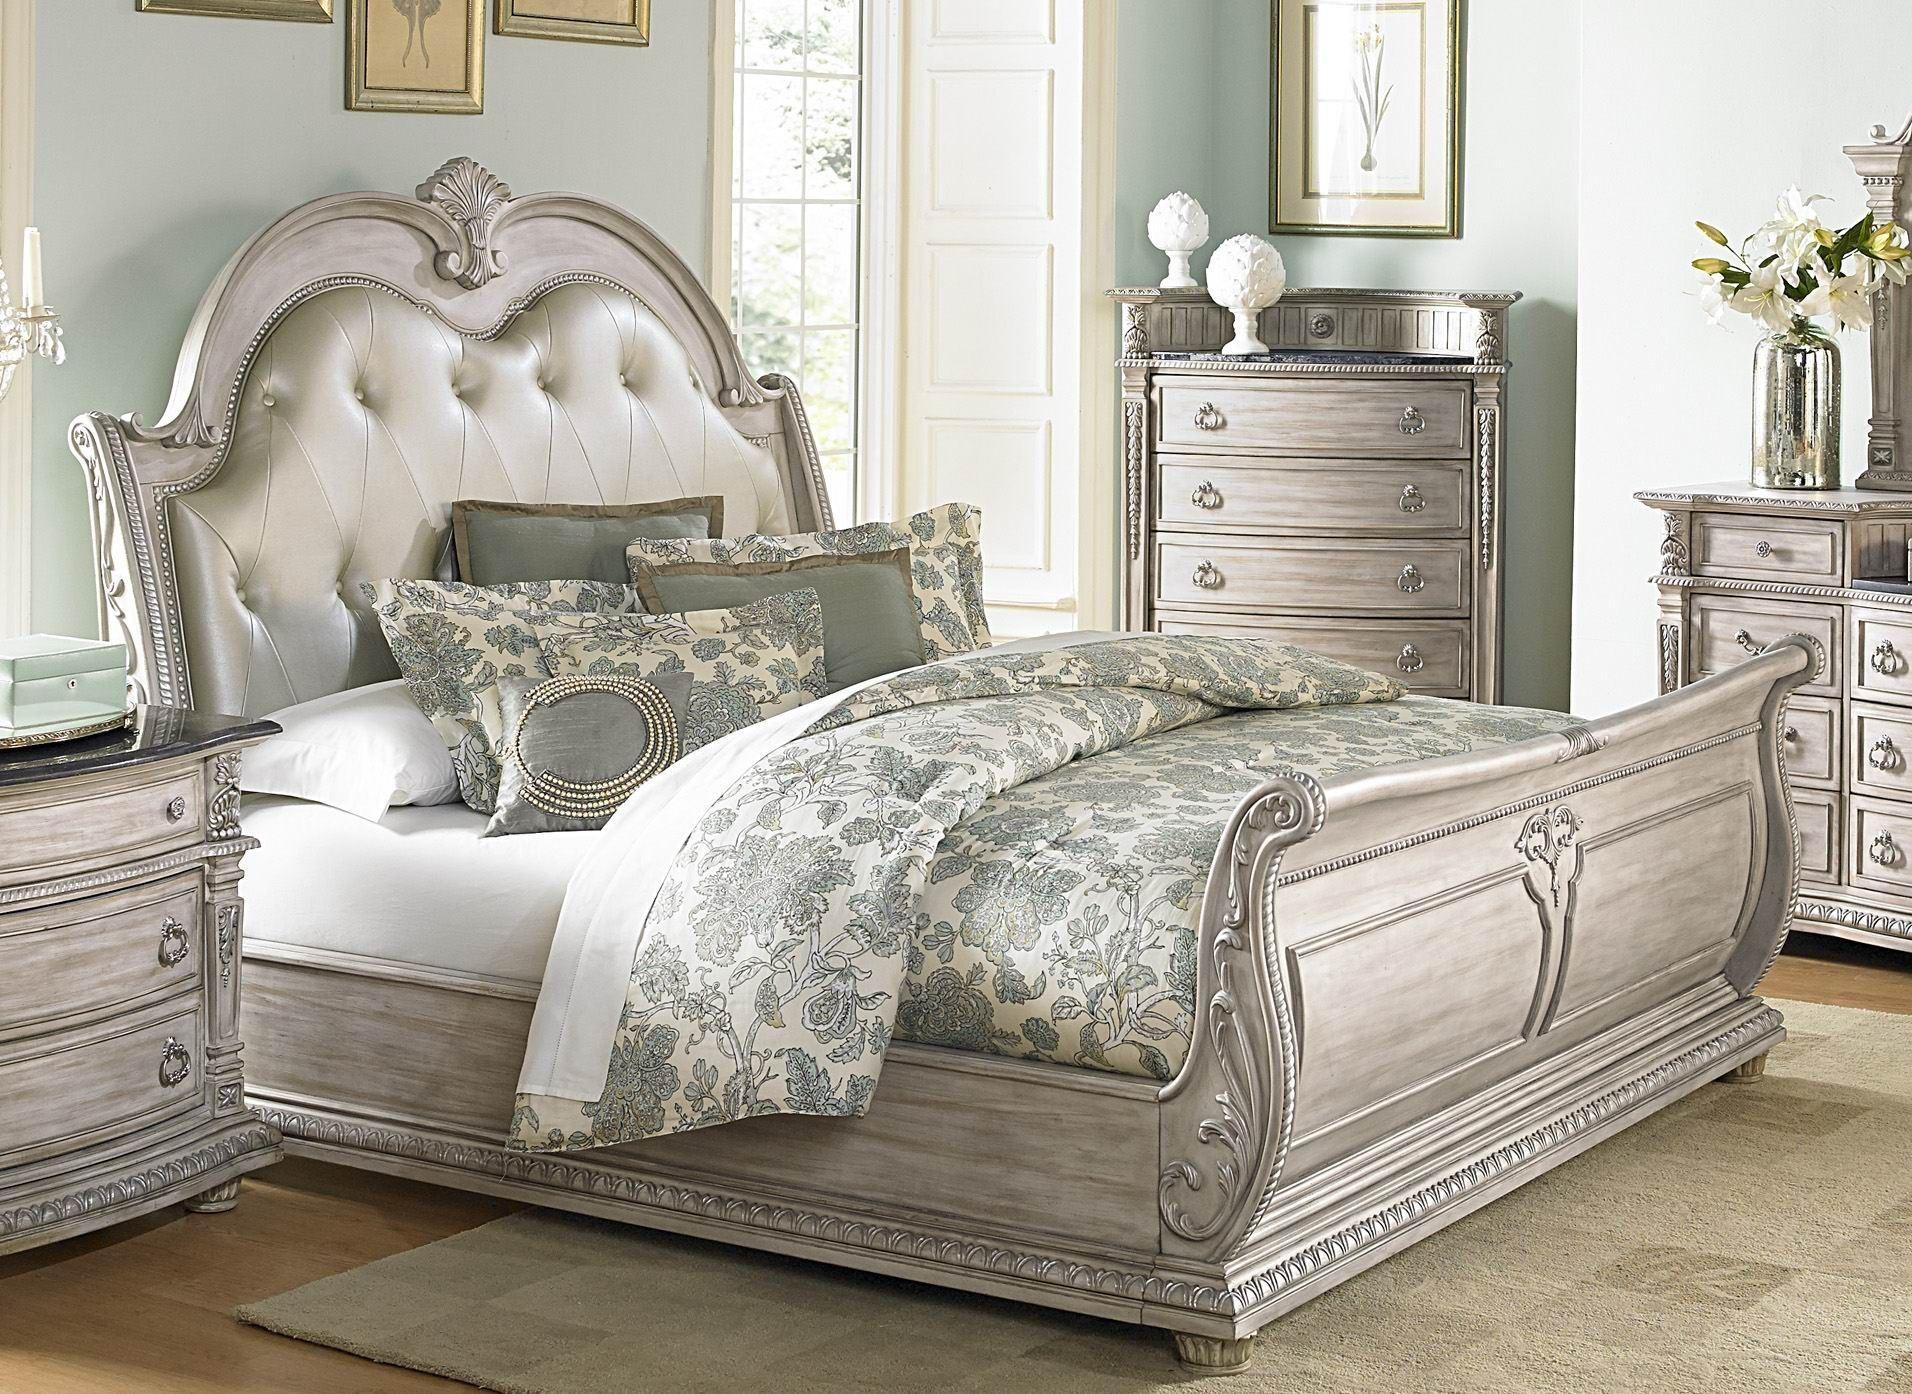 Palace Ii White Wash Bonded Leather Sleigh Bedroom Set